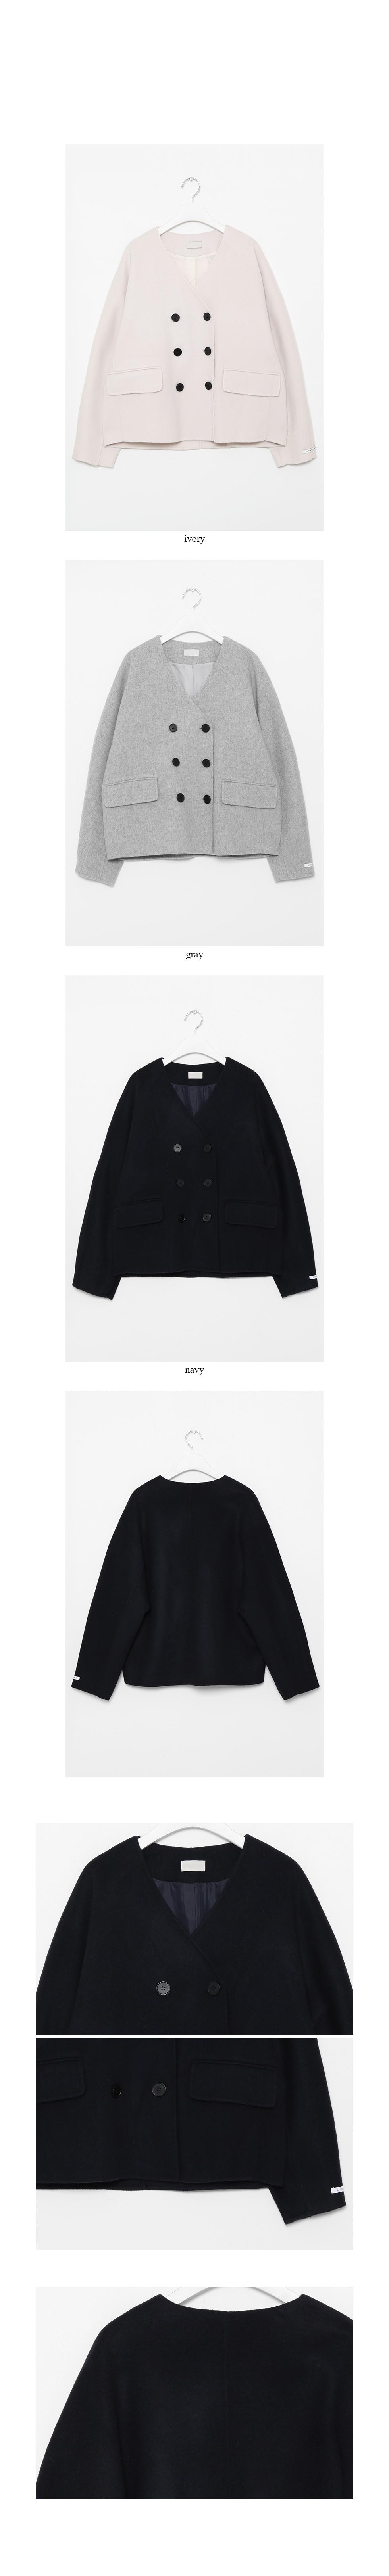 mild handmade short coat